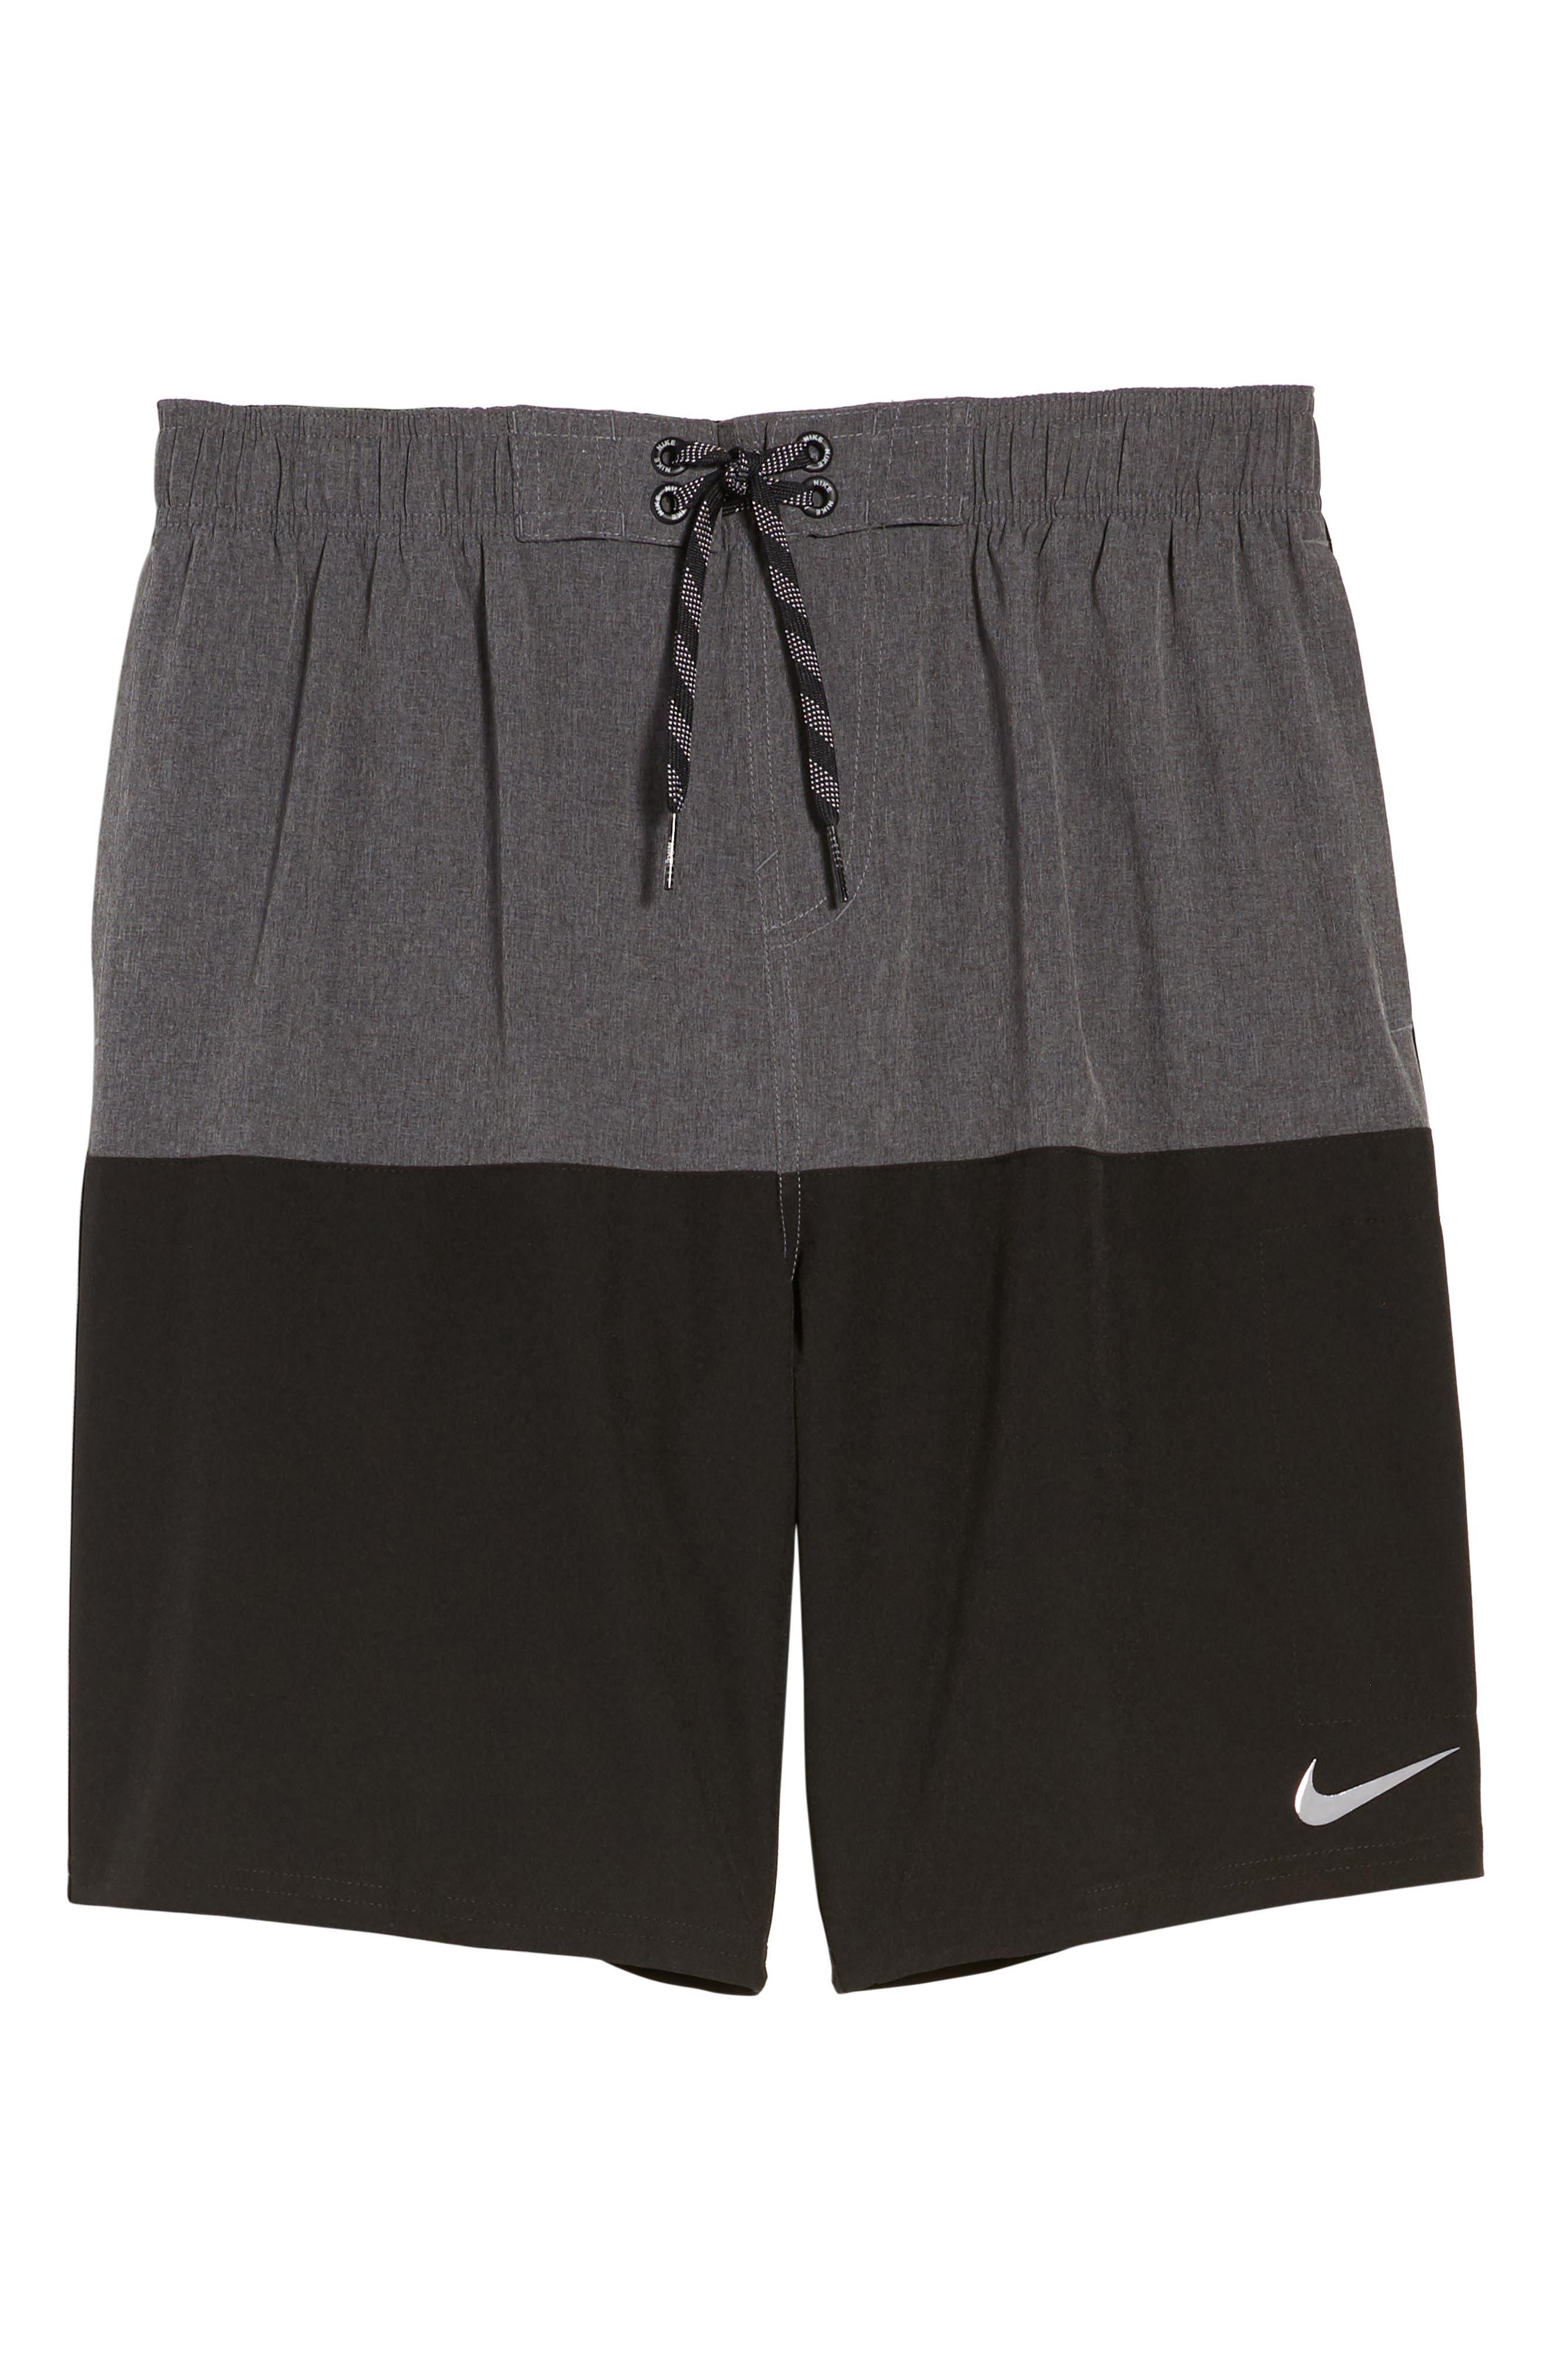 Split Board Shorts,                             Alternate thumbnail 6, color,                             001